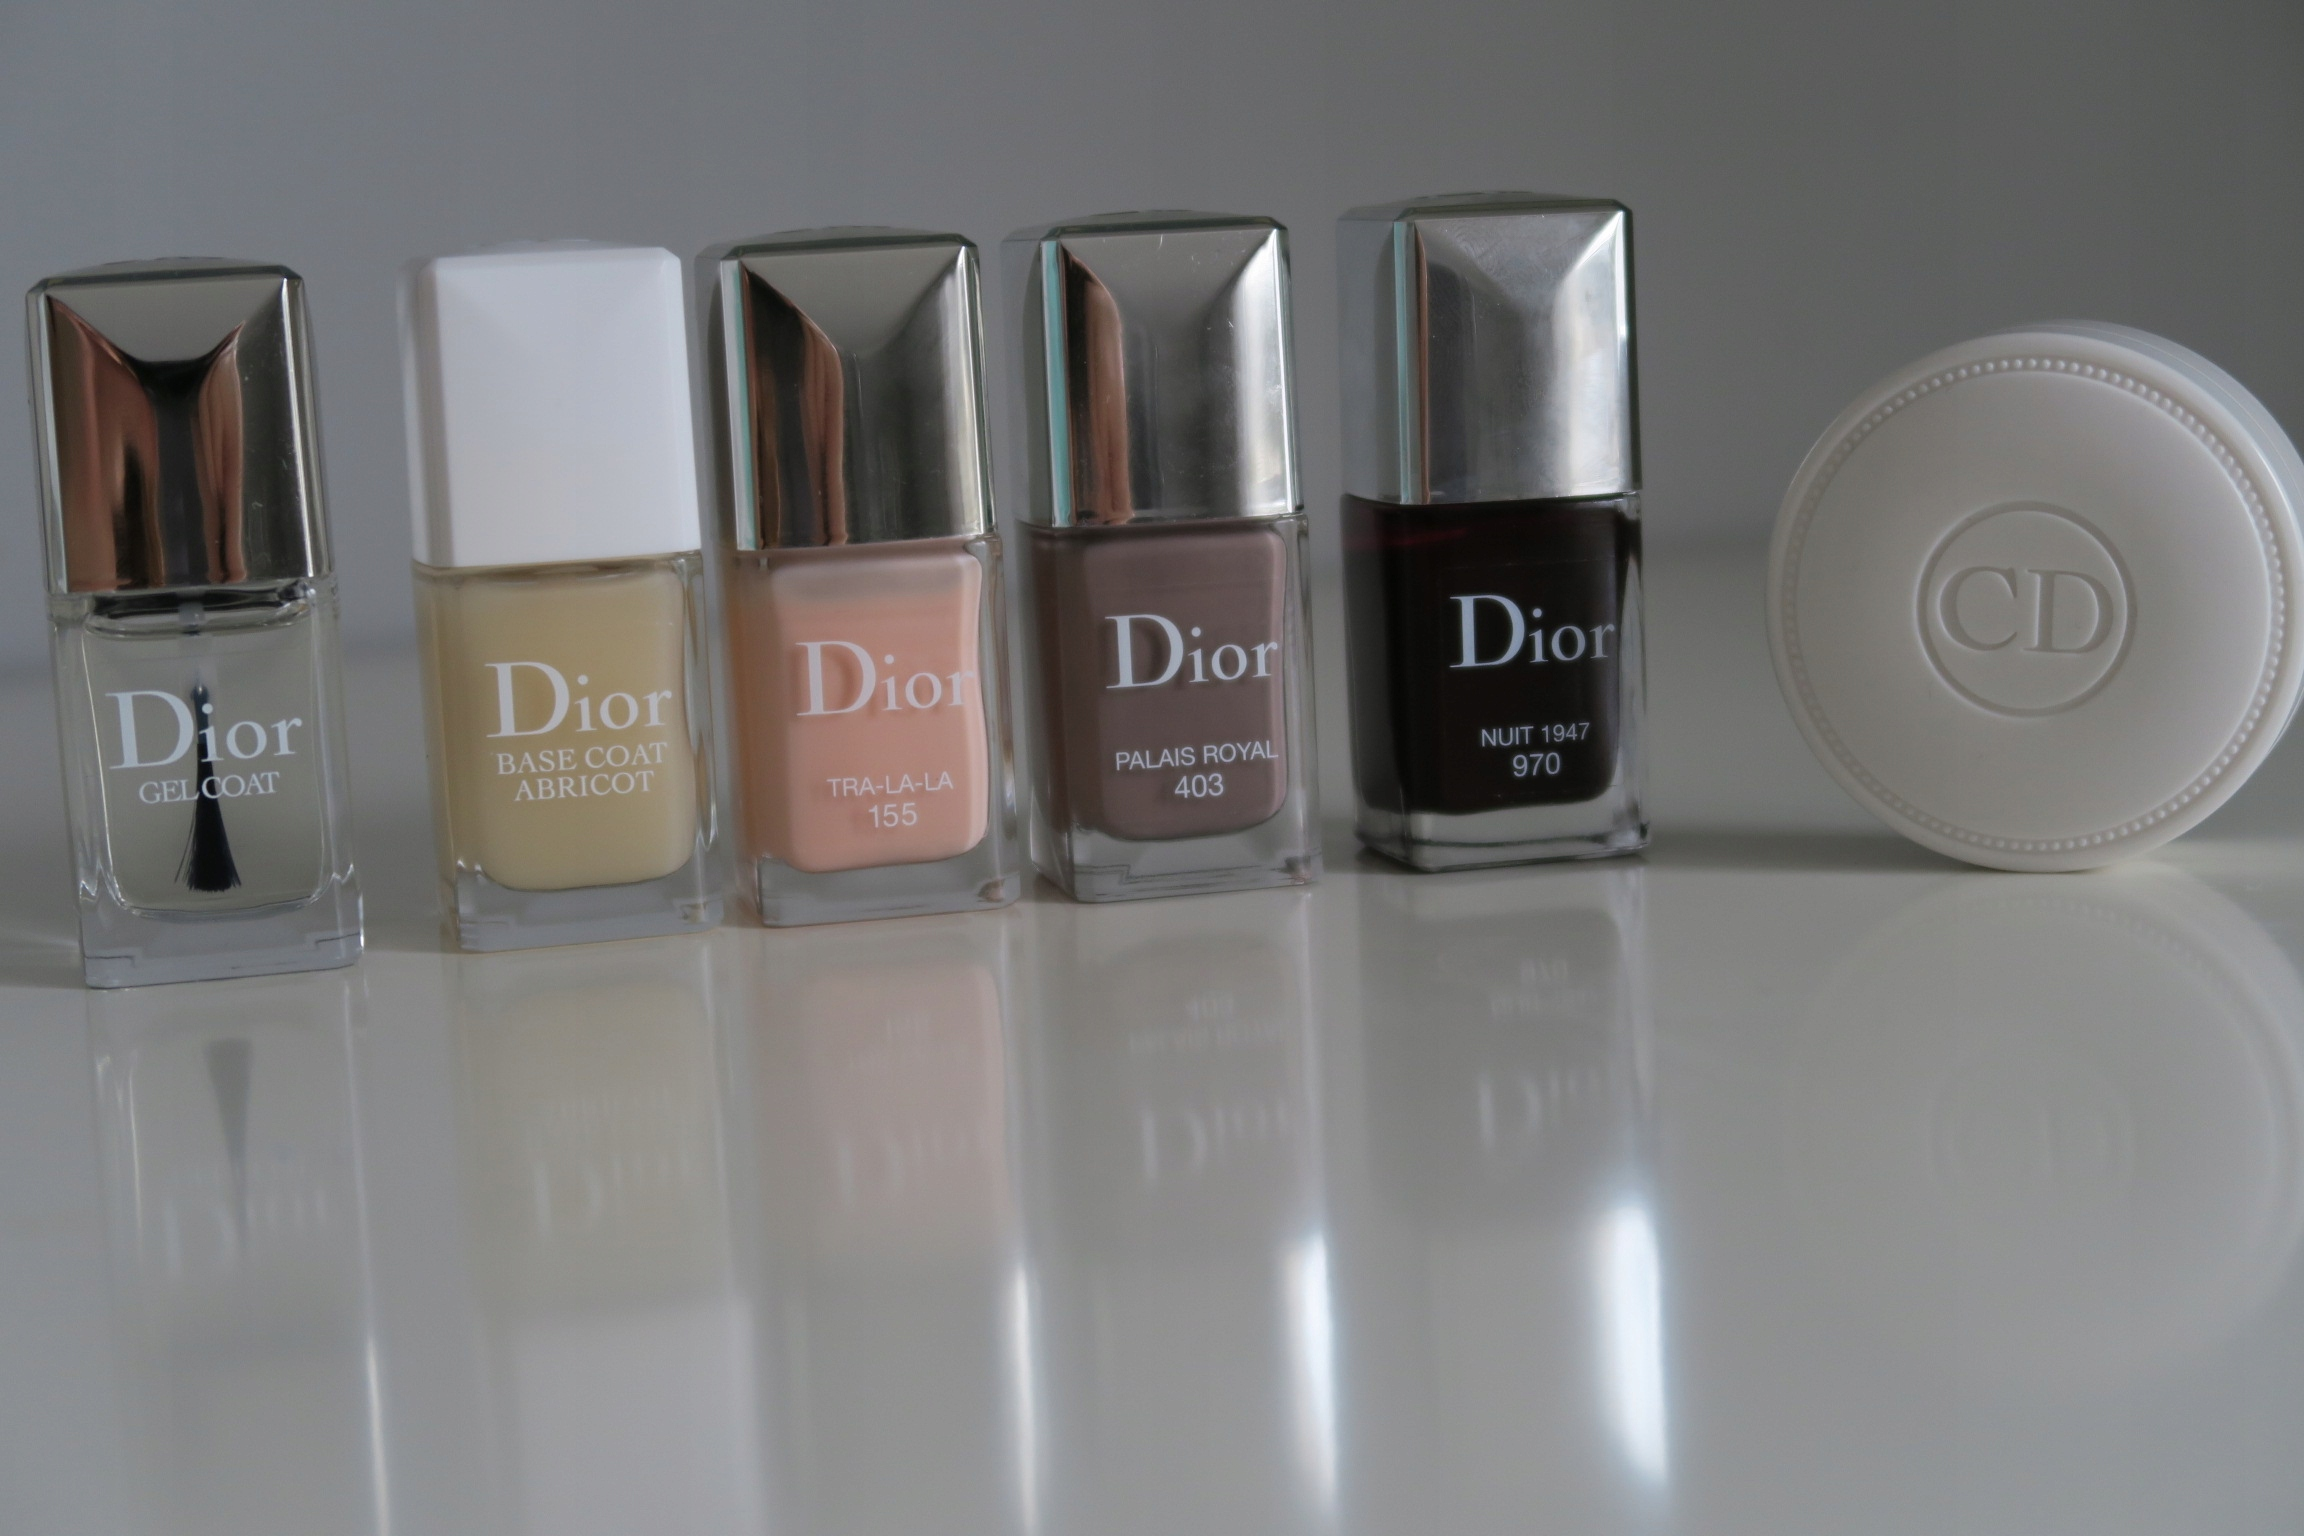 Zestaw Dior Vernis lakiery, top, Base Coat Abricot